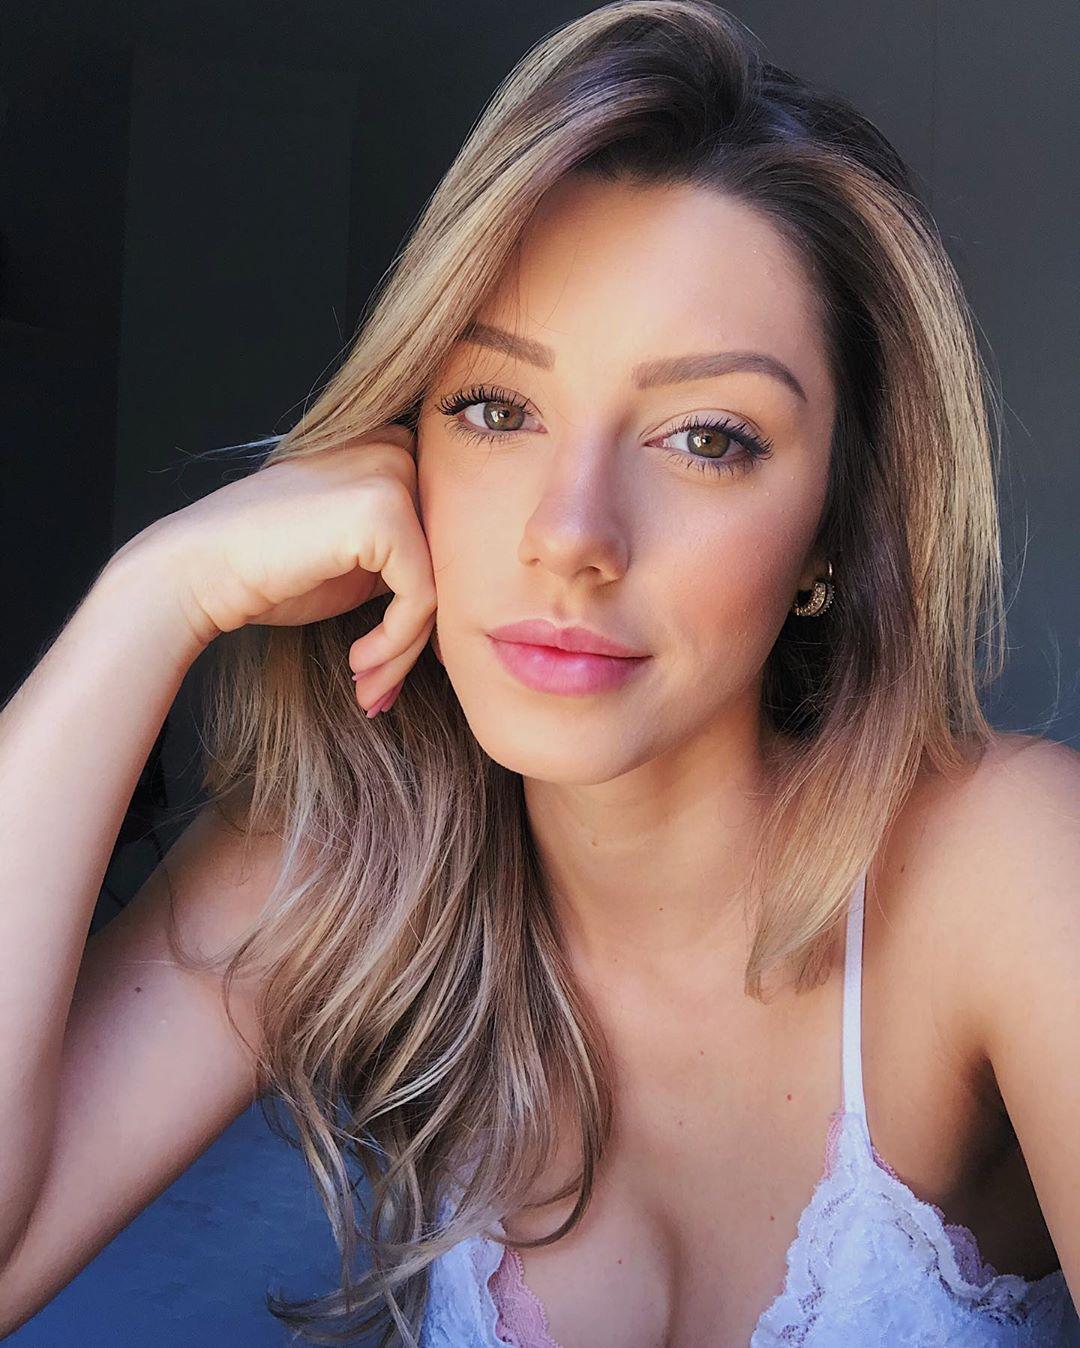 isabela stella, candidata a miss parana 2020, miss arapongas 2017/2019. 91409510